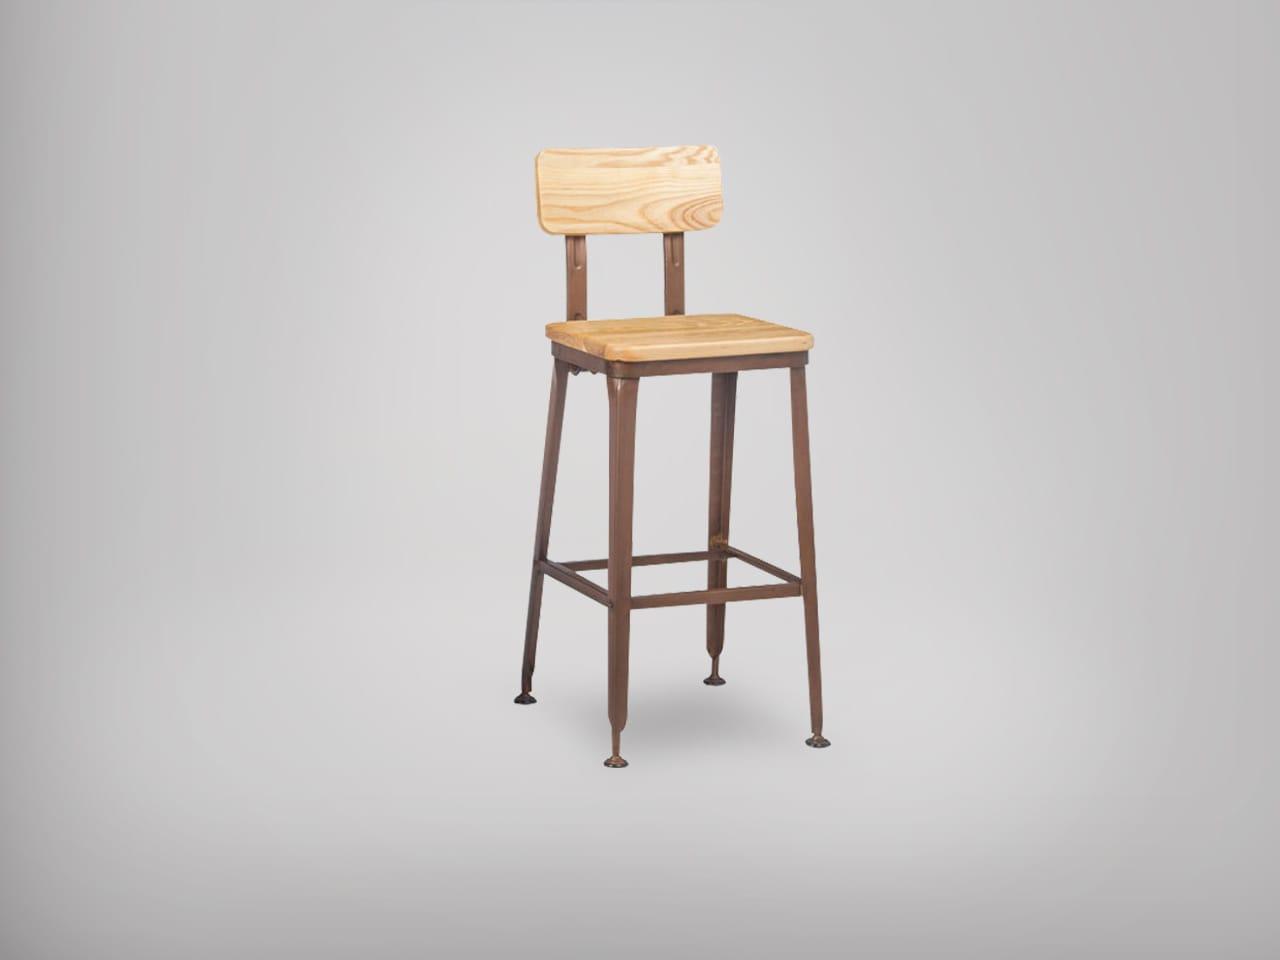 Lick Barchair Wood Comfort Design The Chair amp Table  : 120Website Lick Barchair Wood from www.comfortfurniture.com.sg size 1280 x 960 jpeg 115kB